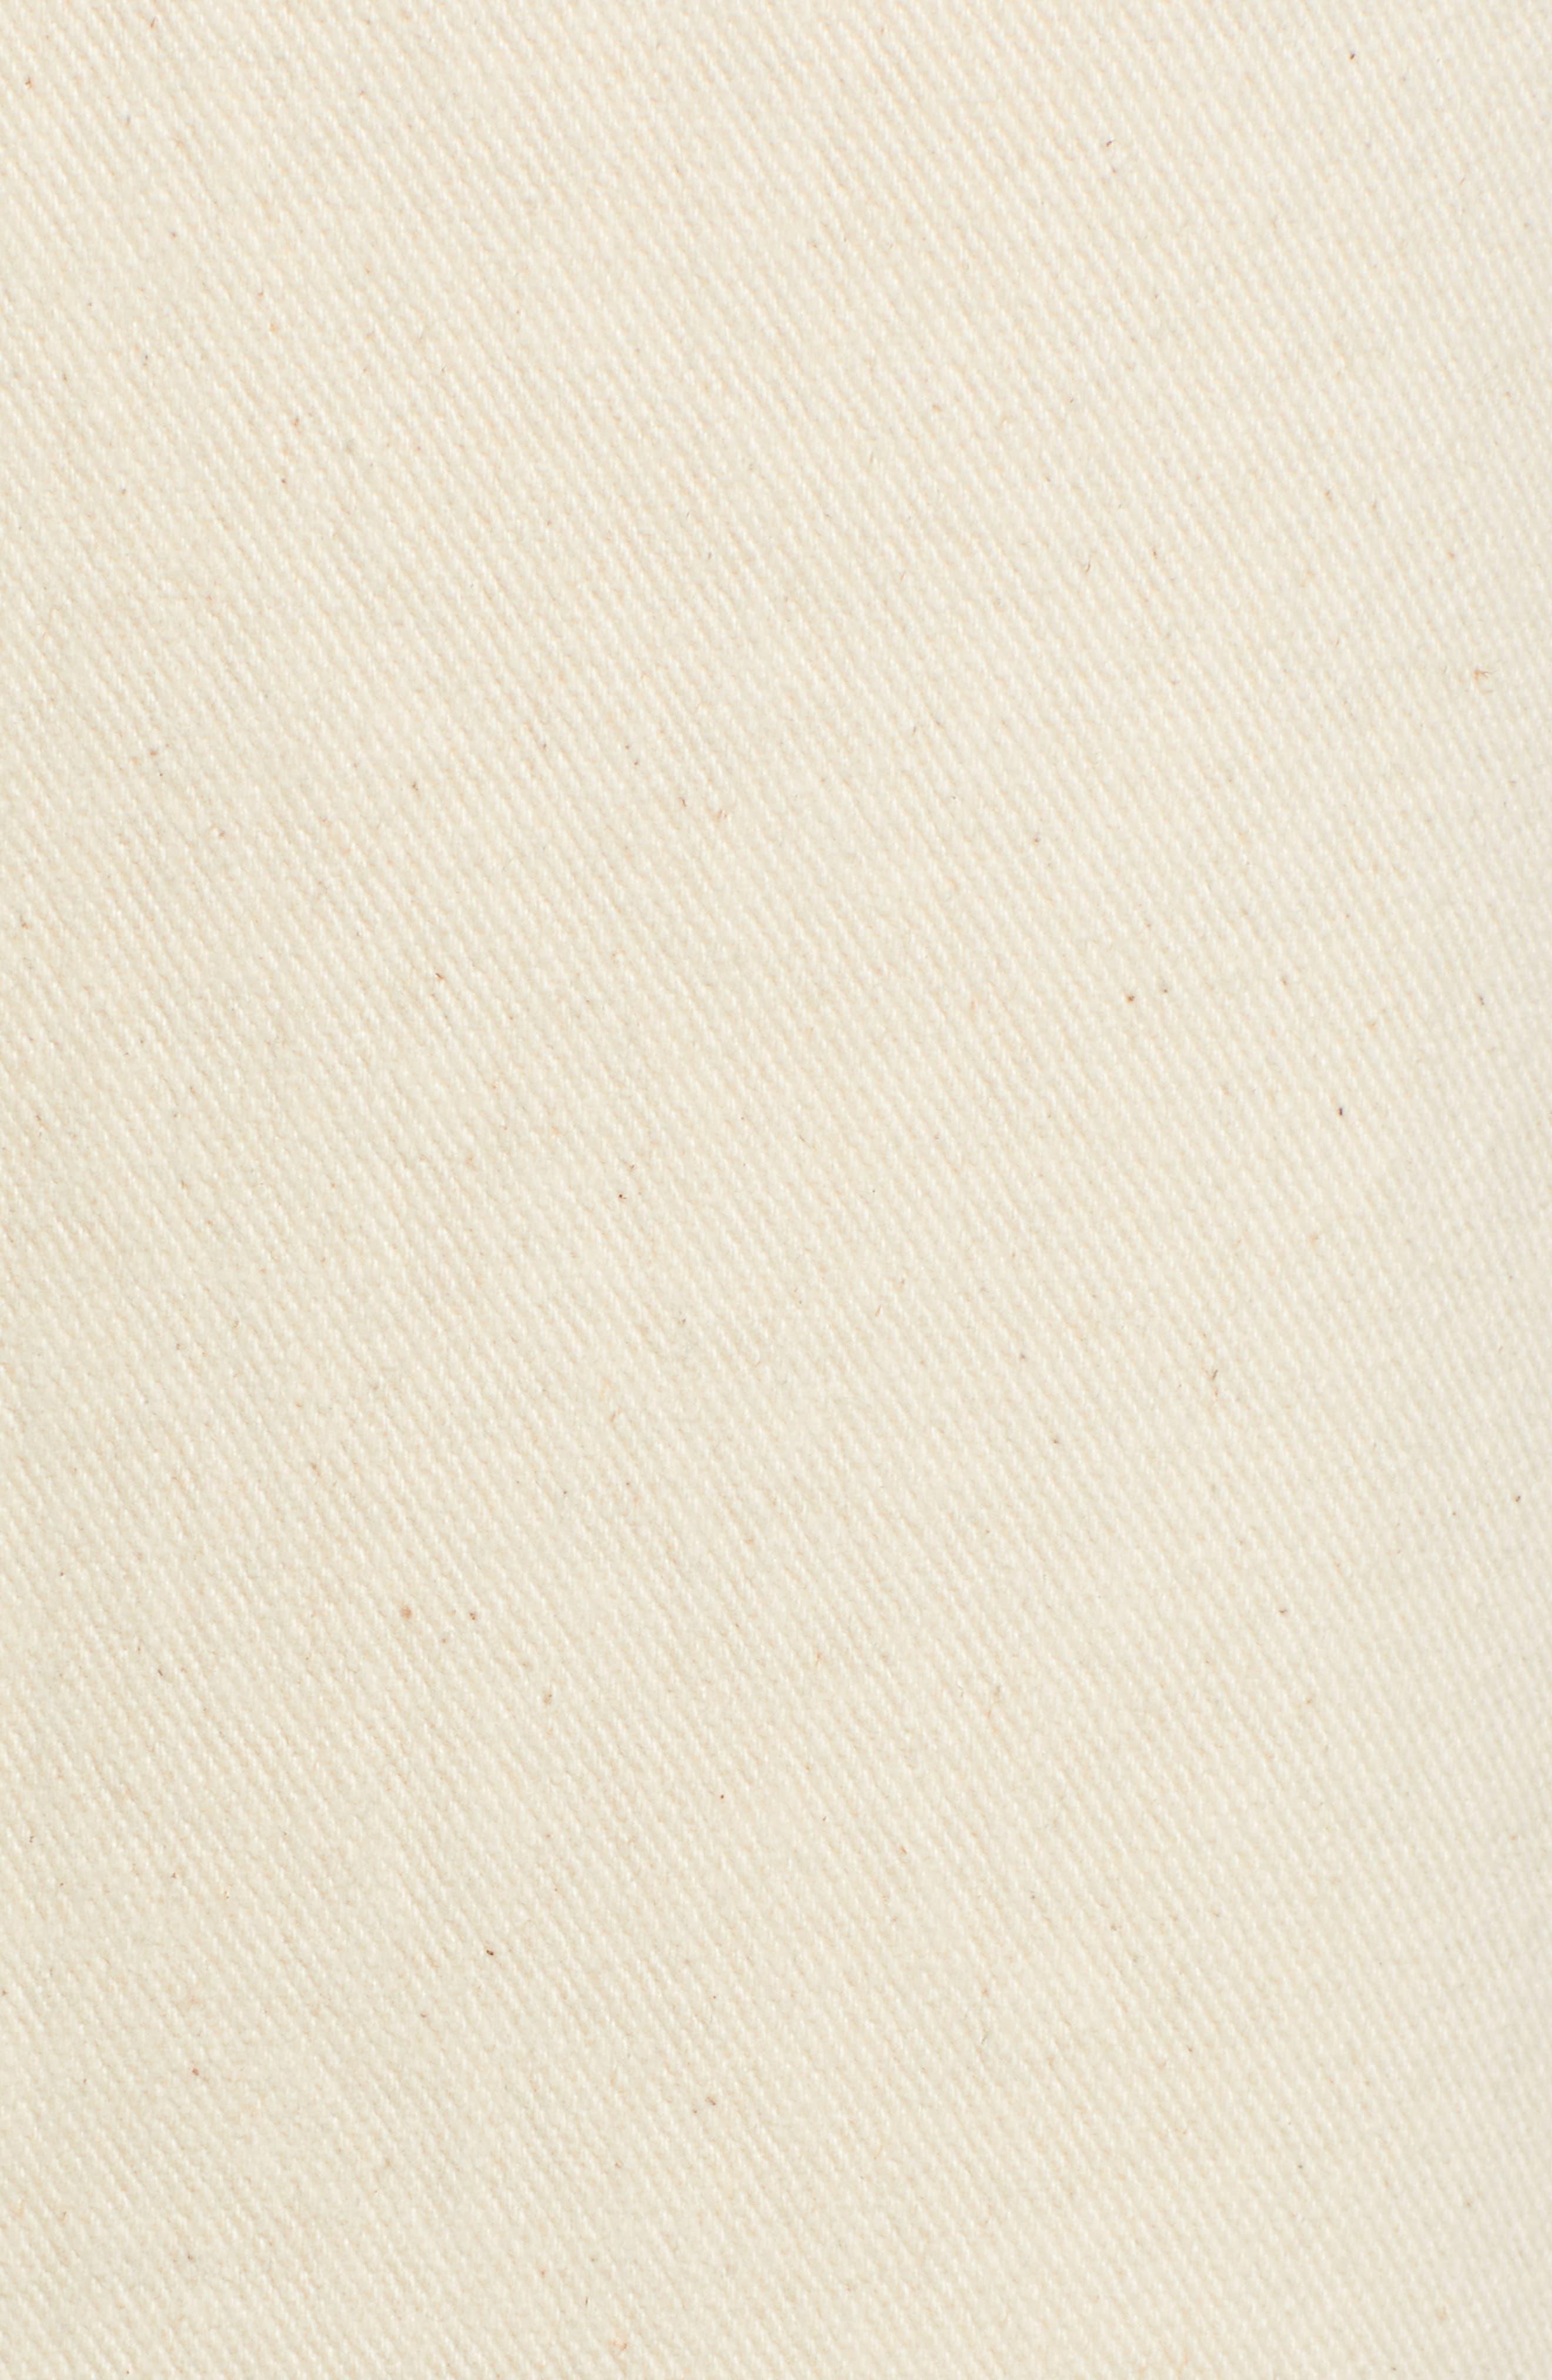 CHRISELLE LIM COLLECTION, Chriselle Lim Marine Midi Skirt, Alternate thumbnail 5, color, BONE